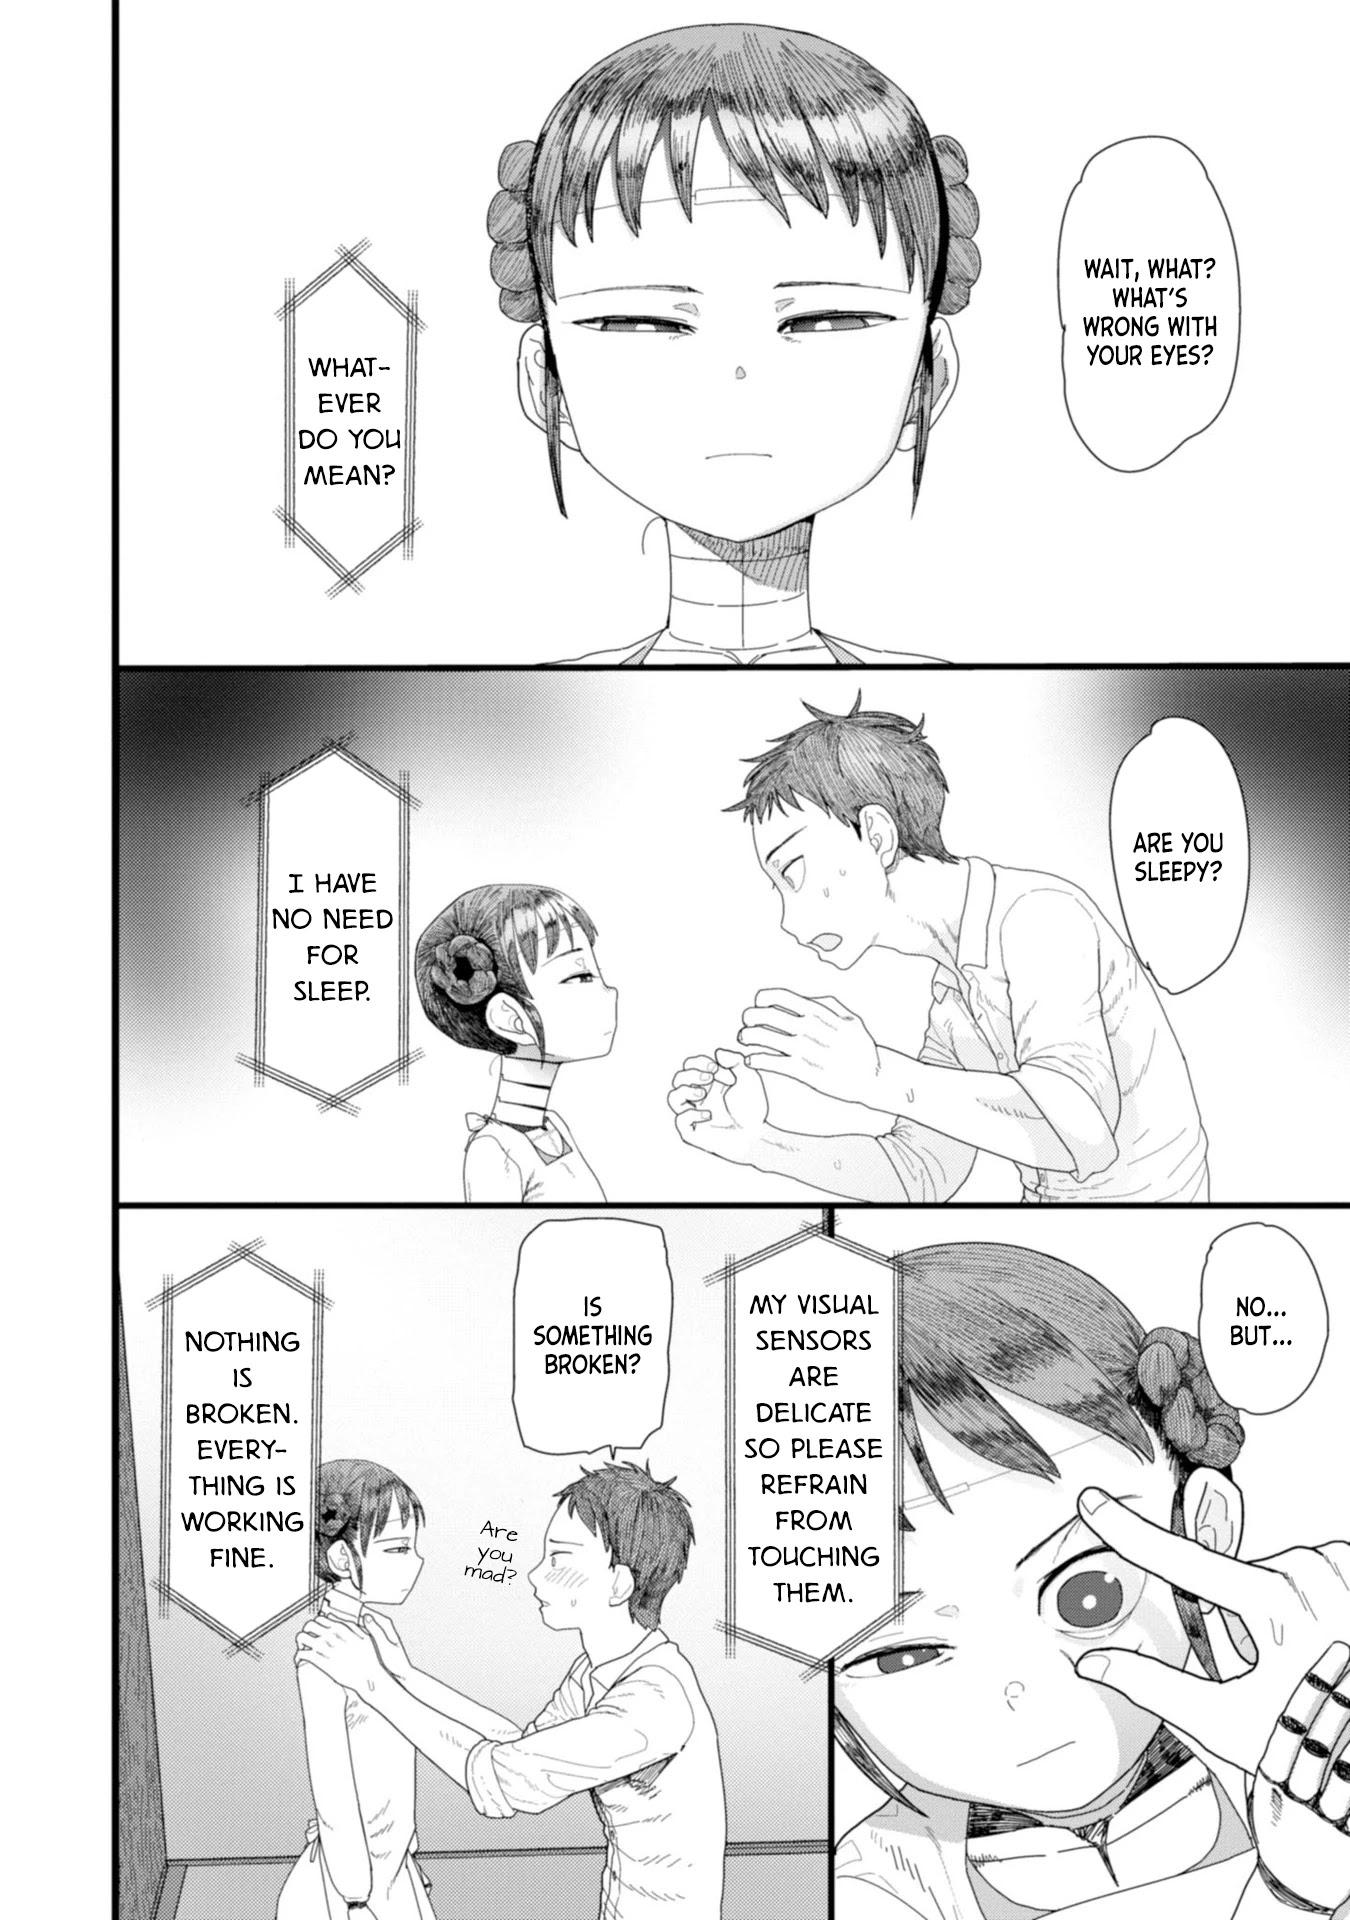 Dilarang Baper! 5 Manga ini Membuatmu Ingin Cepat Menikah! 3